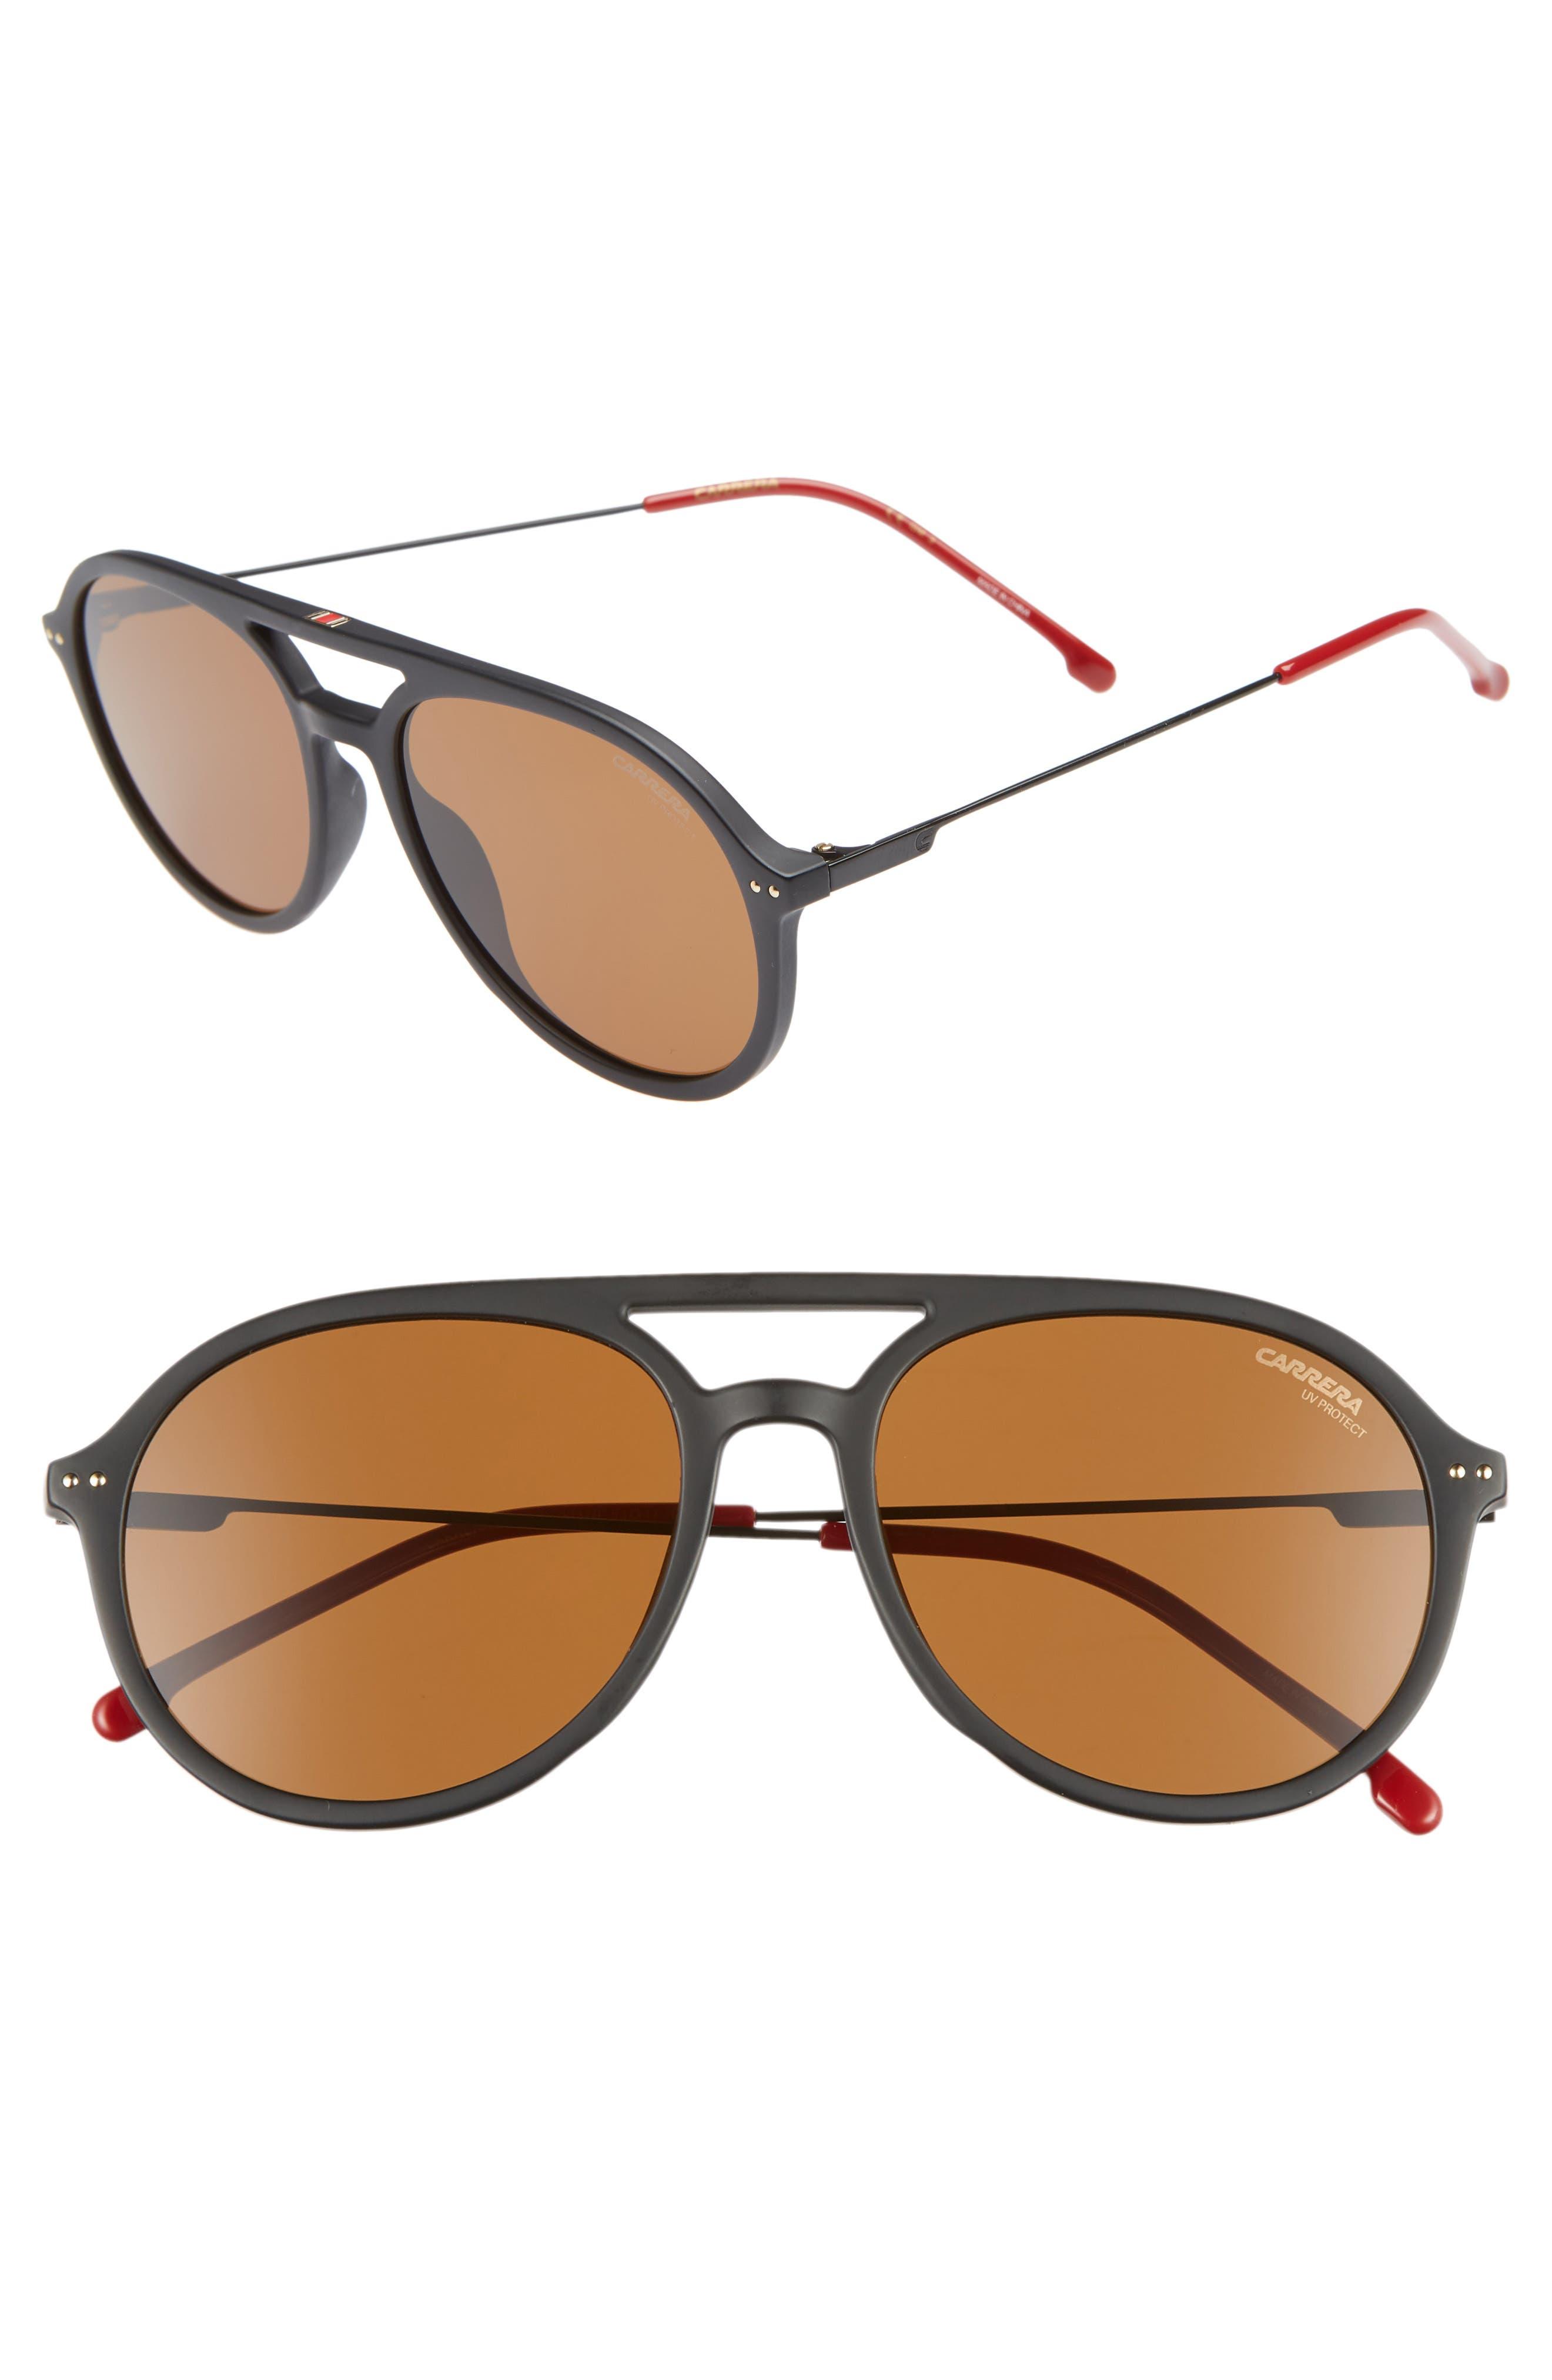 53mm Aviator Sunglasses,                         Main,                         color, MATTE BLACK